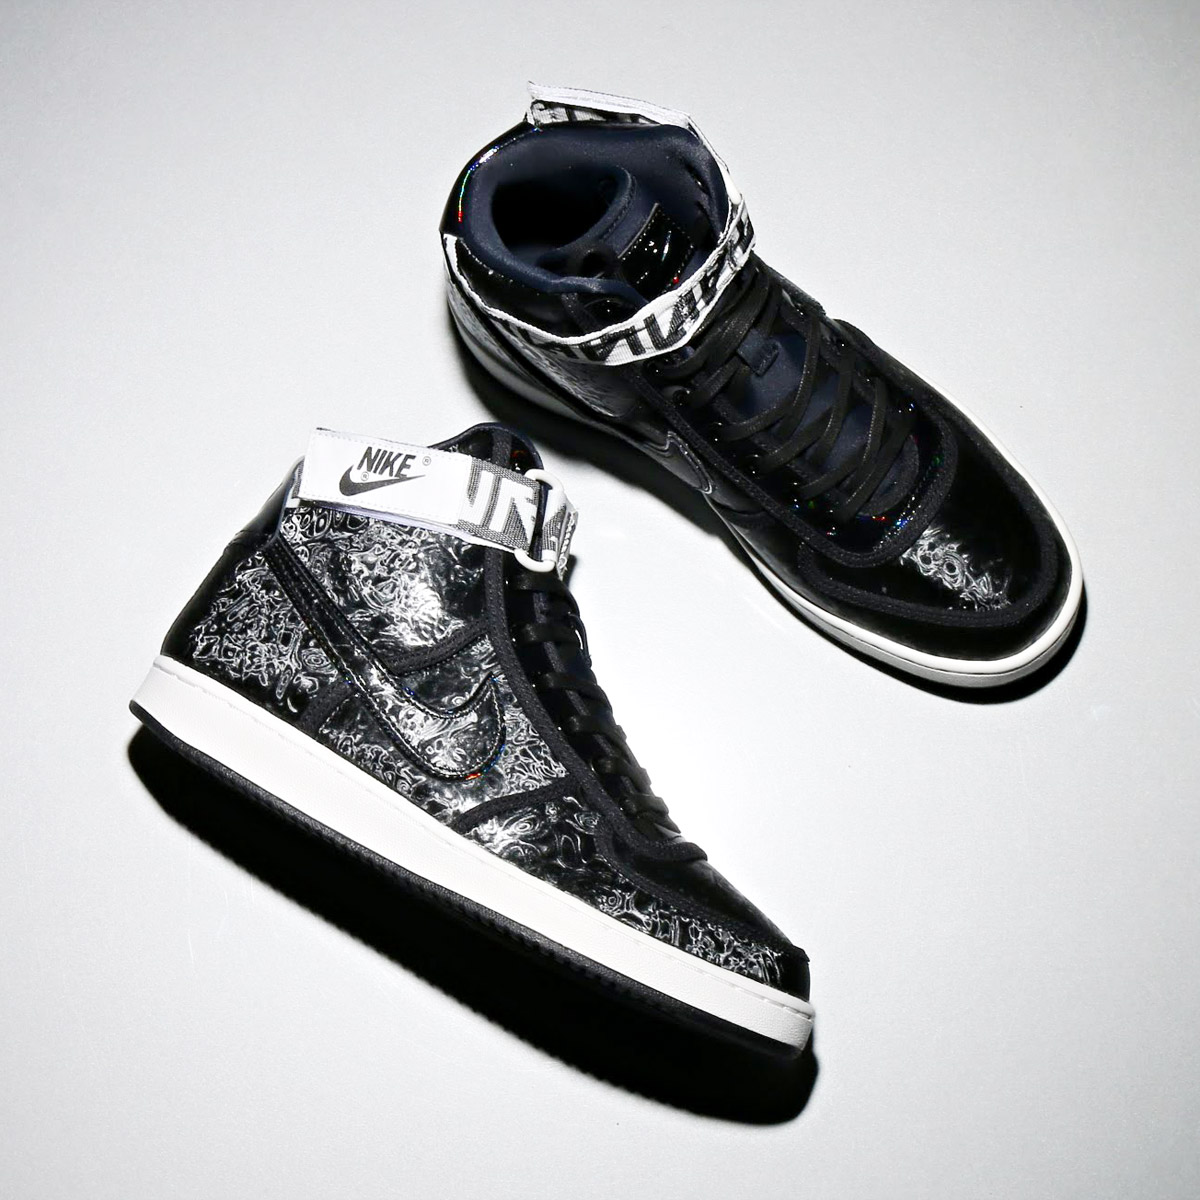 b5918ca29c79ff NIKE W VANDAL HI LX (Nike women Vandal high LX) (BLACK BLACK-SUMMIT WHITE )18SP-S